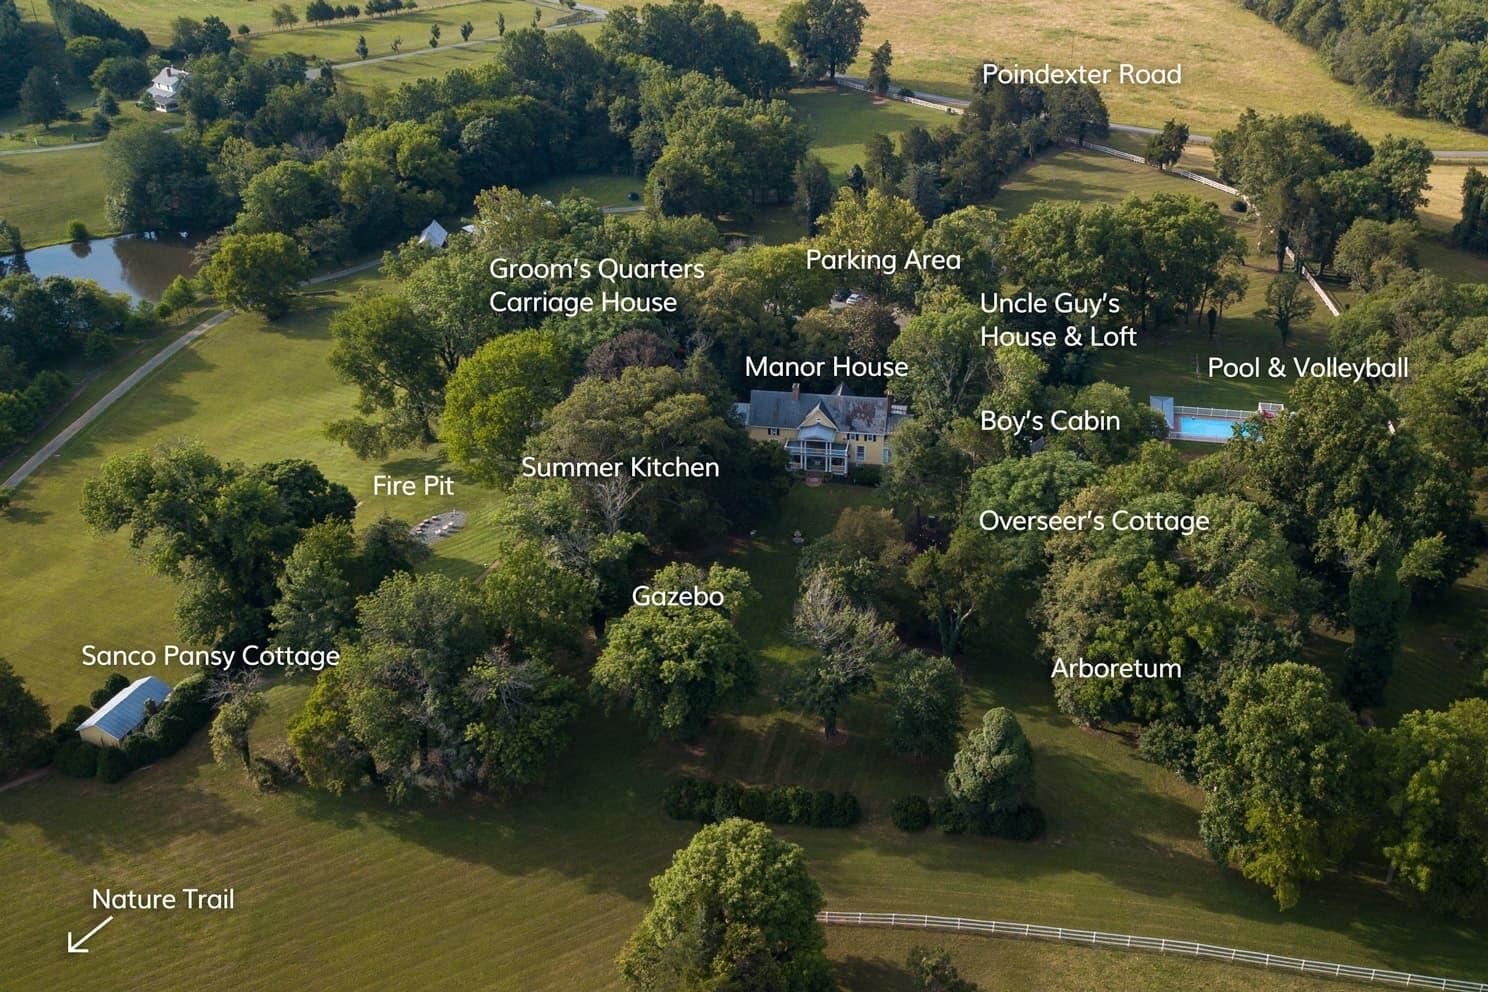 Prospect Hill Inn property map